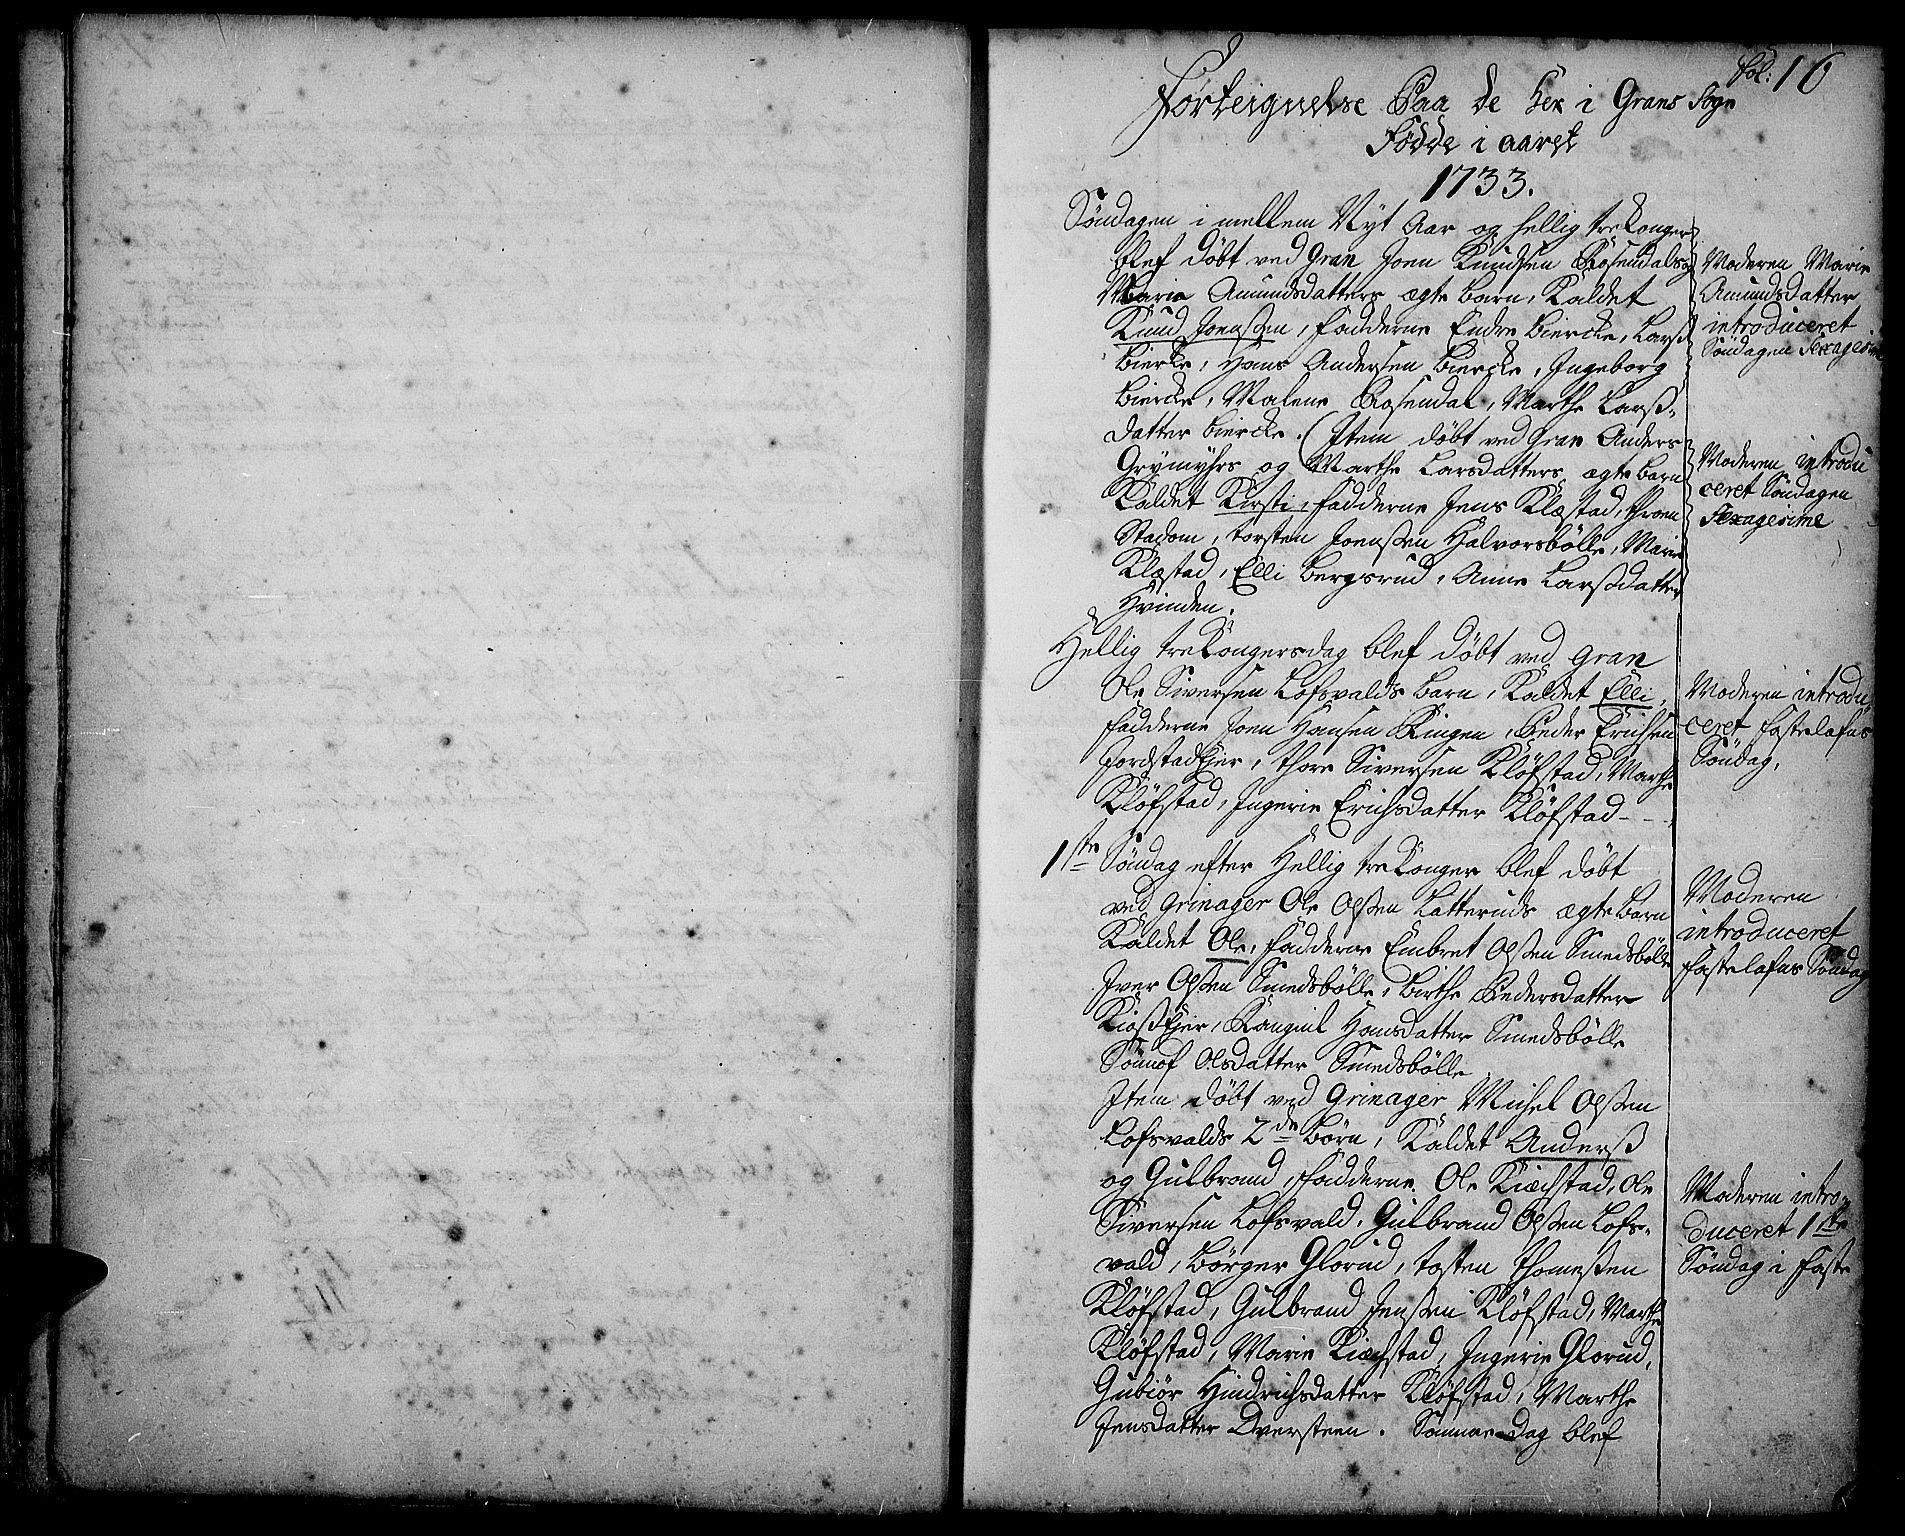 SAH, Gran prestekontor, Ministerialbok nr. 2, 1732-1744, s. 16